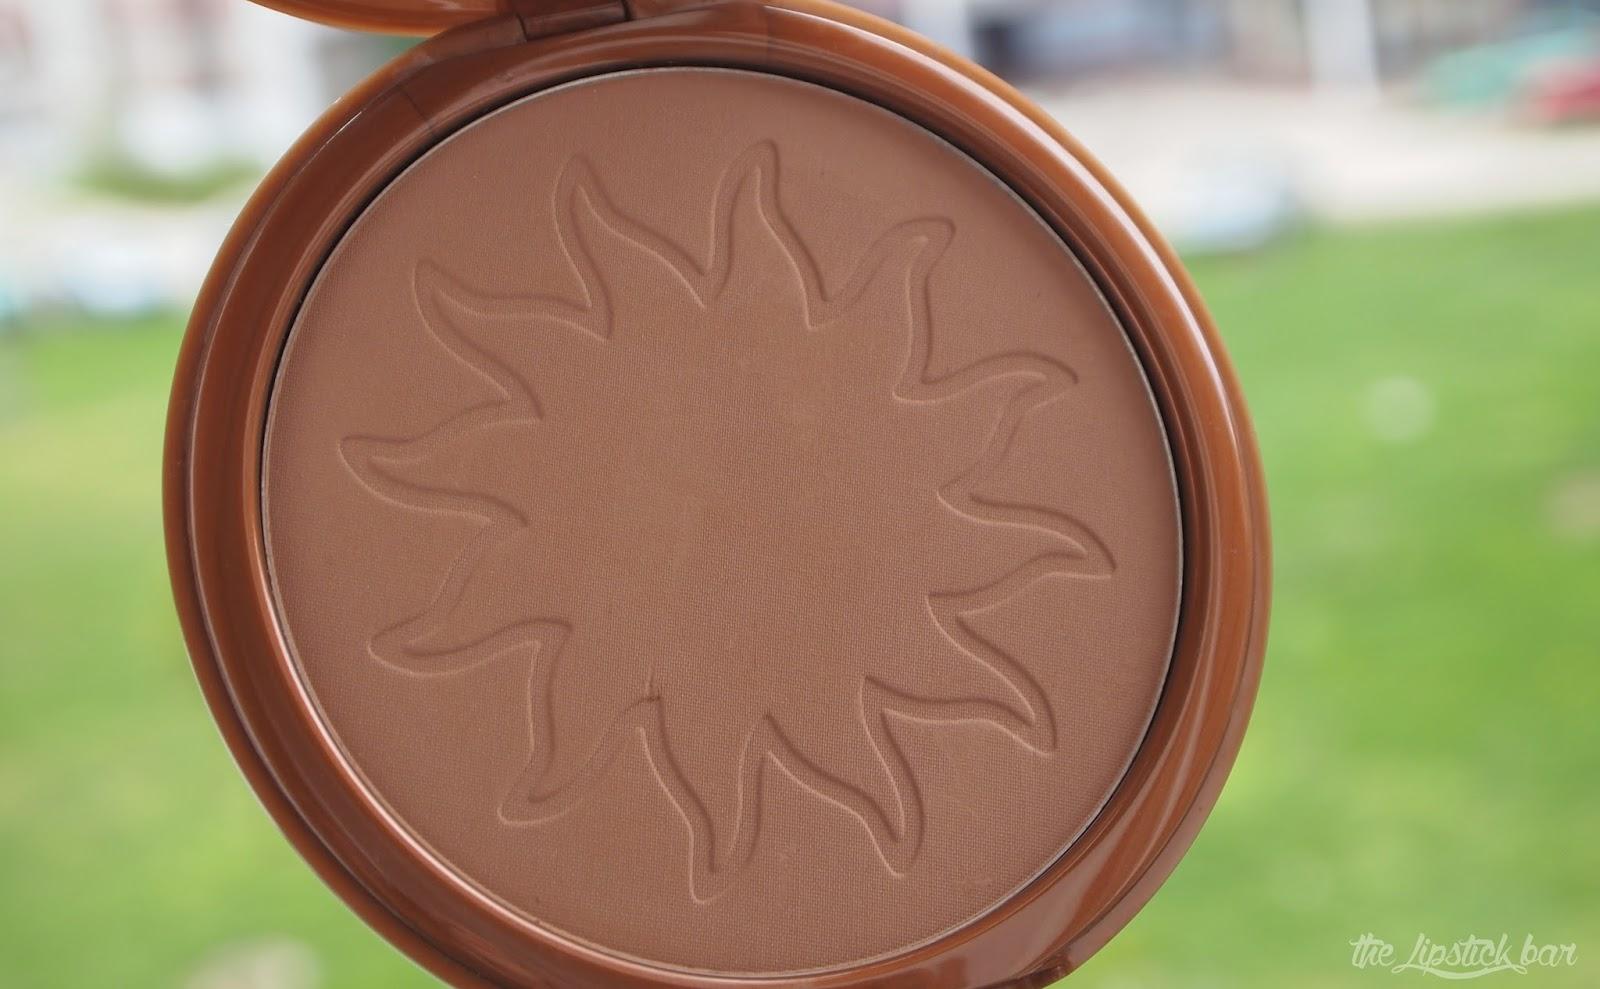 Flormar bronzing powder 05